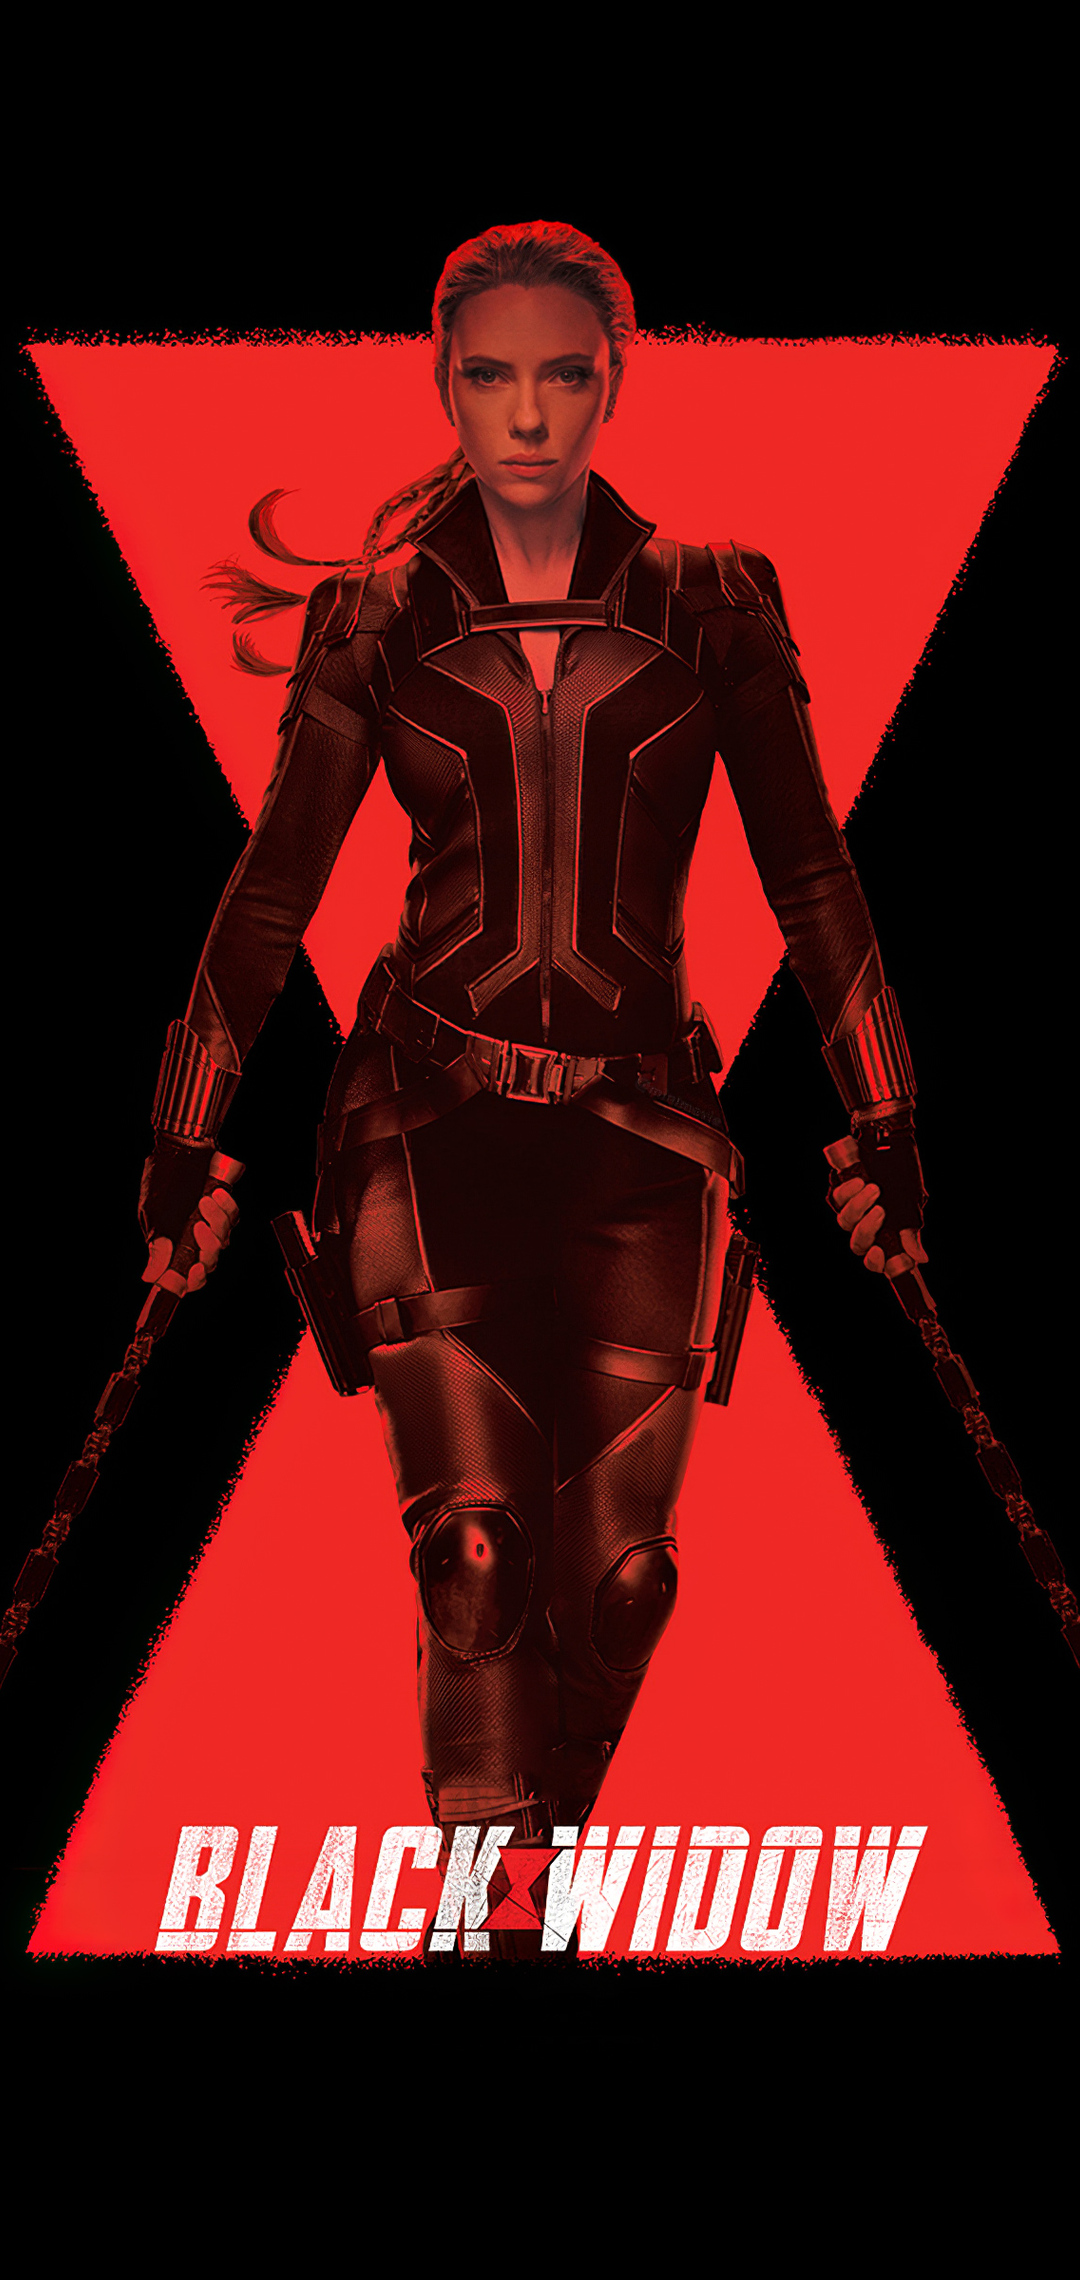 black-widow-4k-2020-4n.jpg